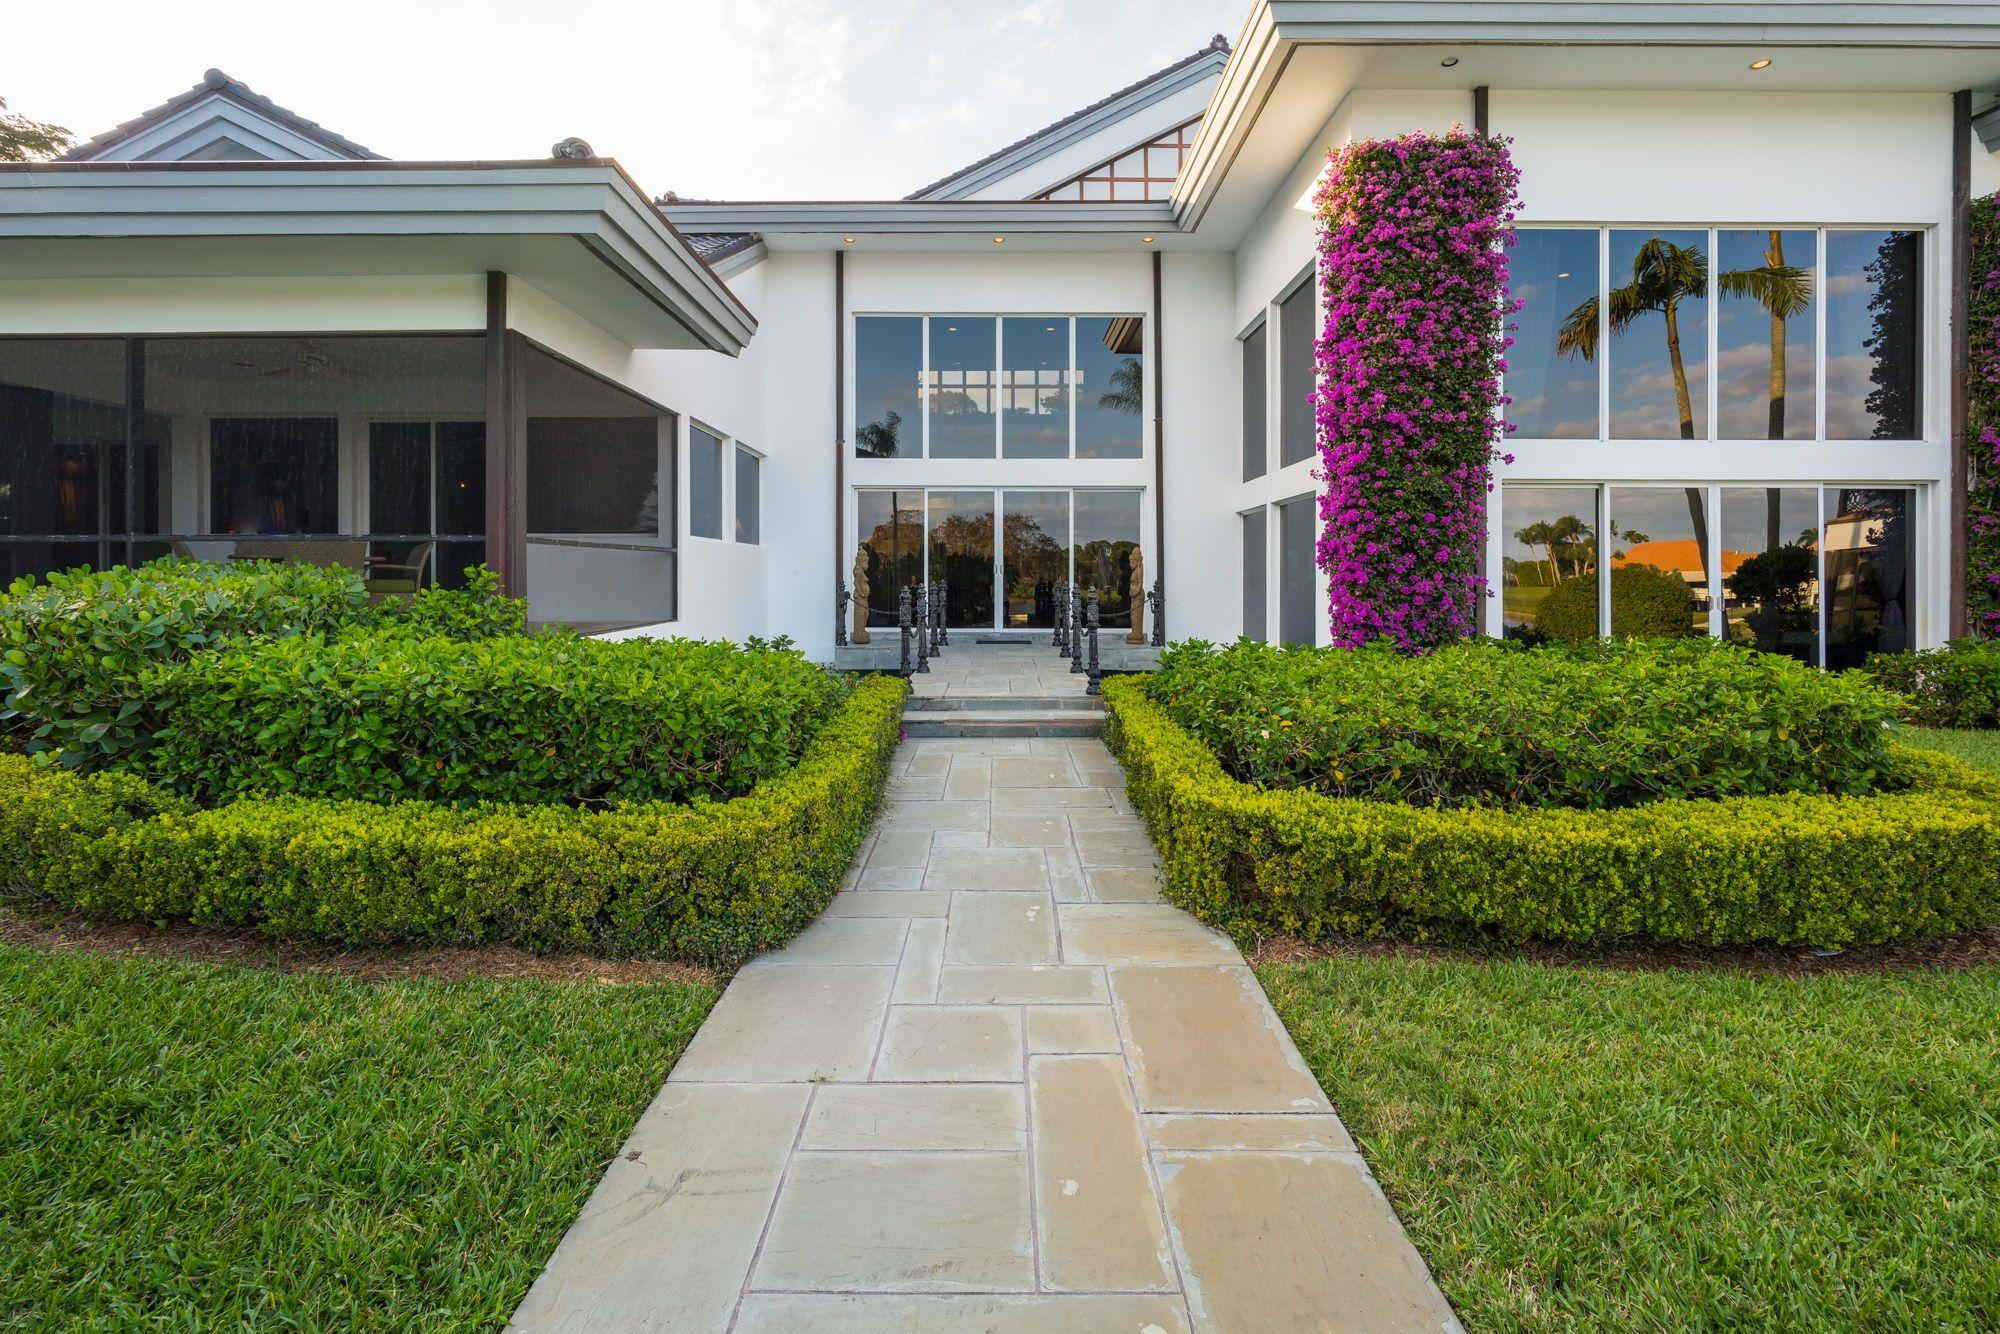 1449 Enclave Circle, West Palm Beach, FL in 2020 | West ...